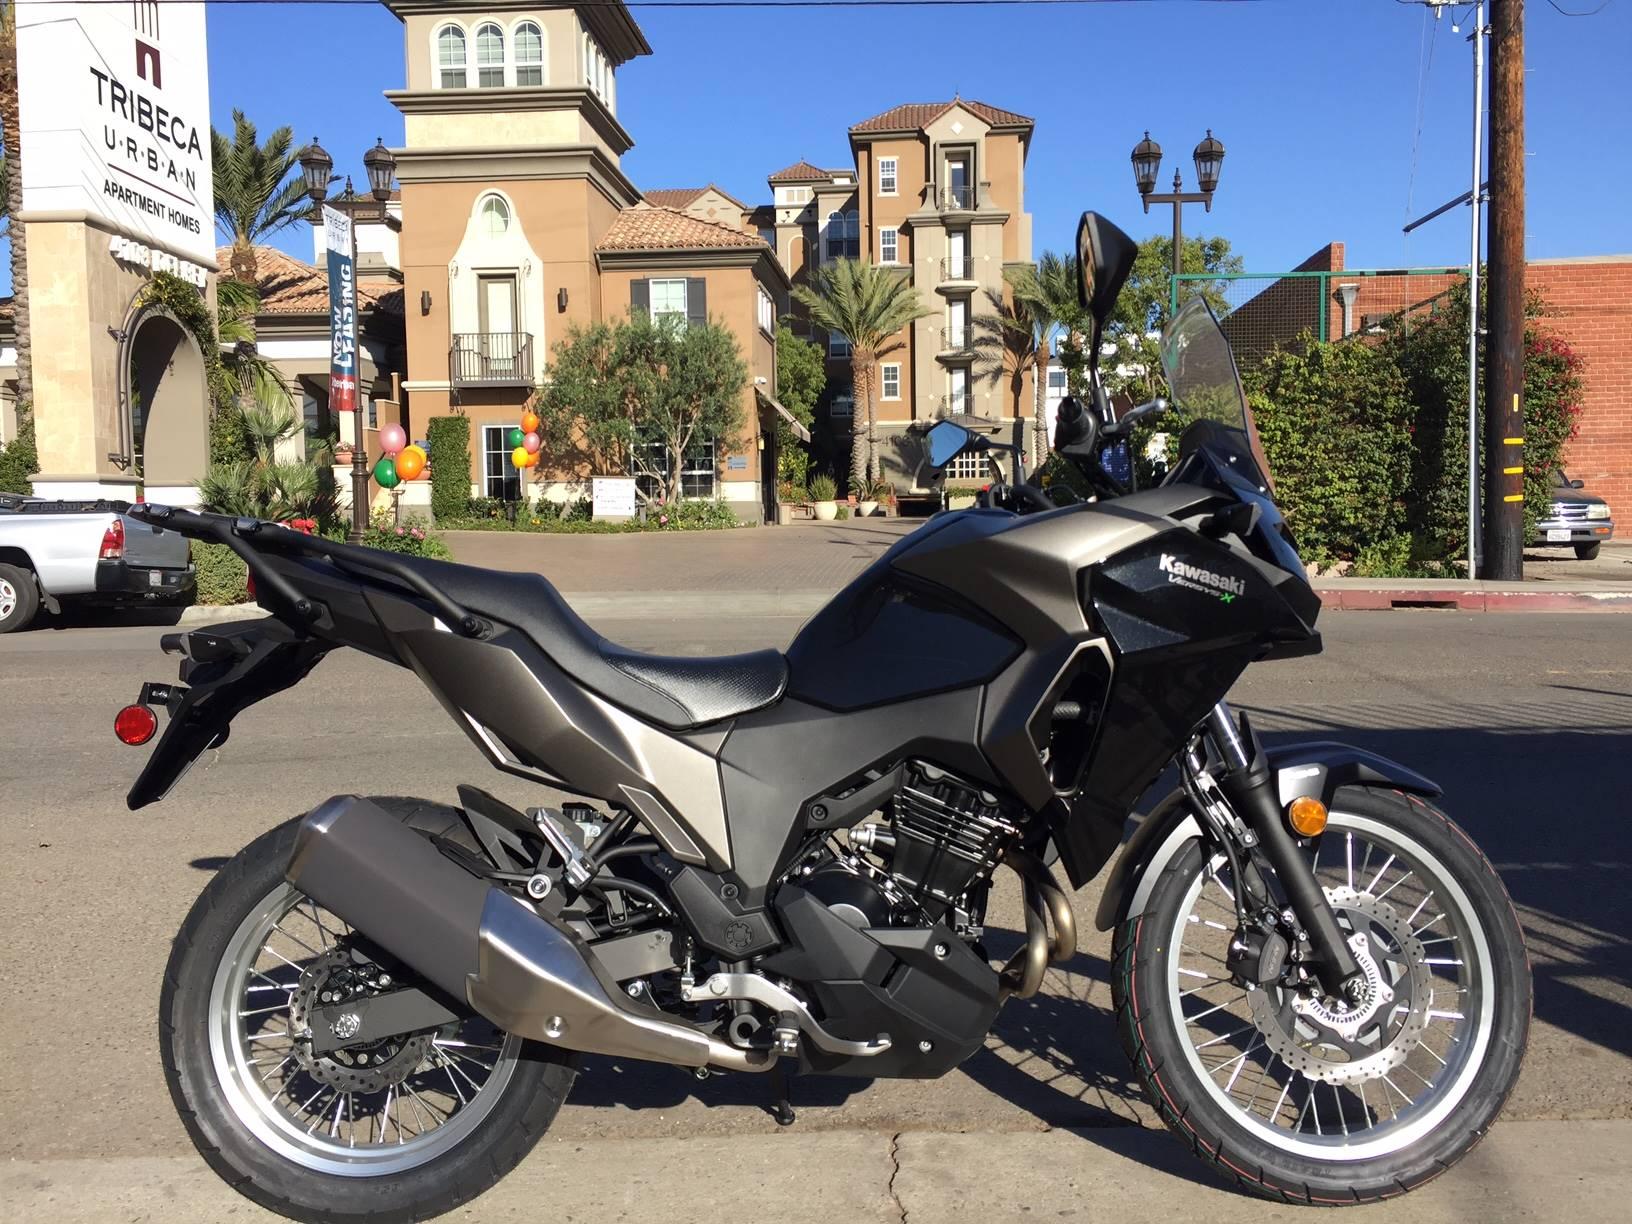 2018 kawasaki versys x 300 abs motorcycles marina del rey california. Black Bedroom Furniture Sets. Home Design Ideas